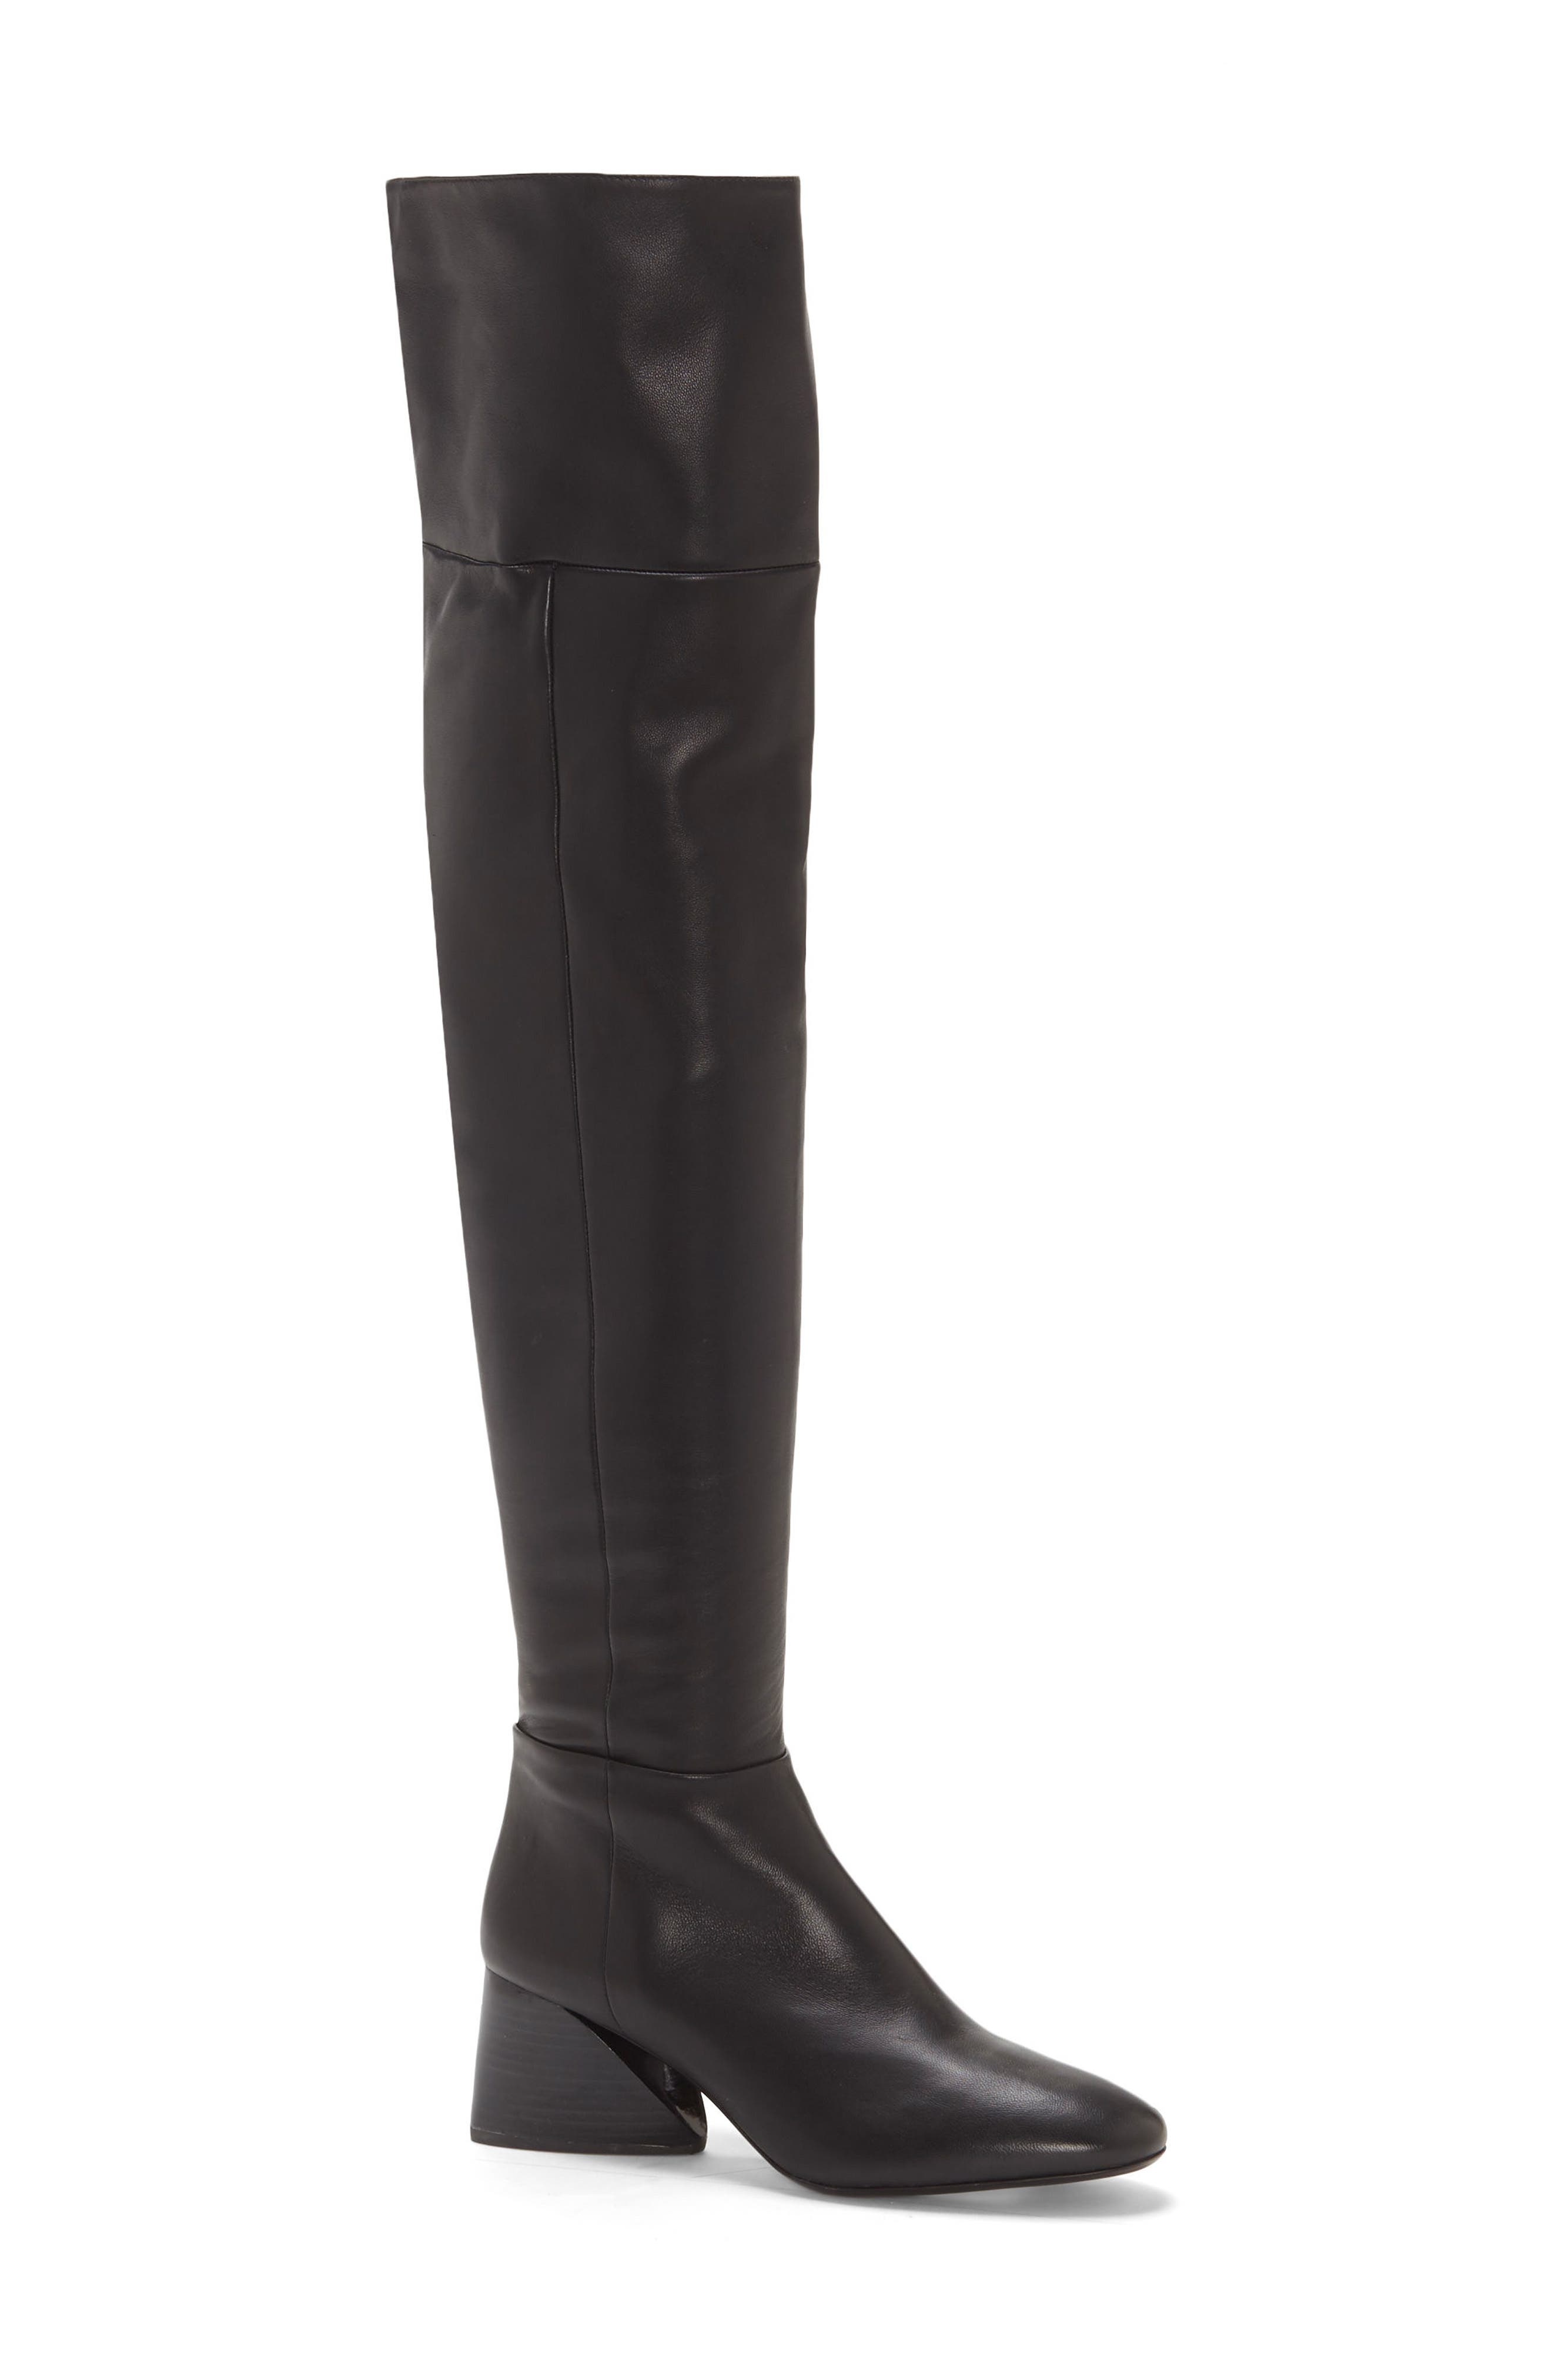 Alternate Image 1 Selected - Mercedes Castillo Aymeline Over-the-Knee Boot (Women)